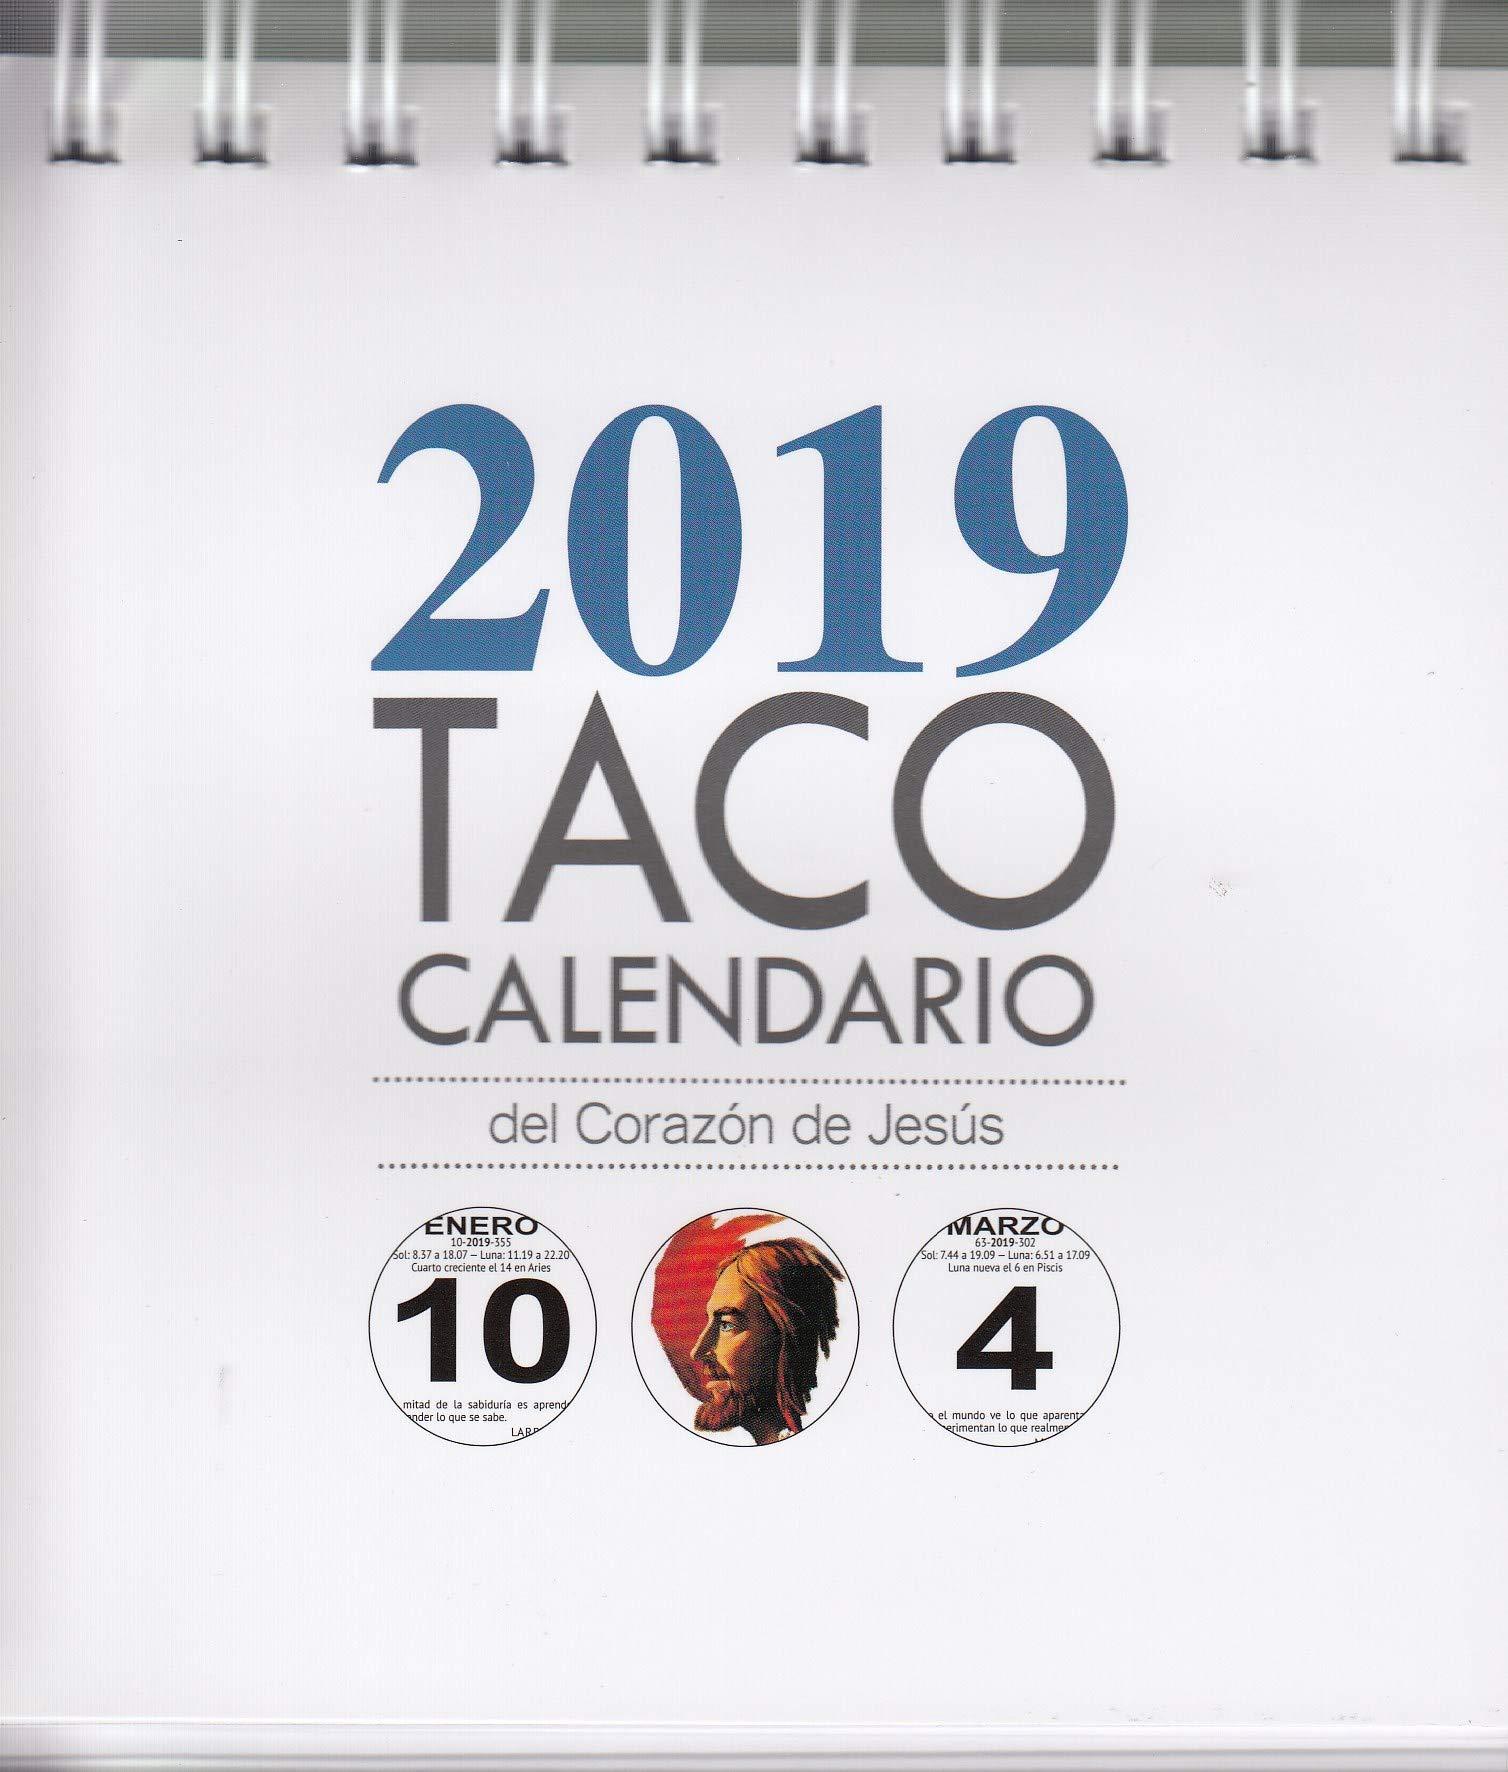 Taco Calendario Sagrado Corazón 2019 Peana. Tapa blanda – 11 sep 2018 Ediciones Mensajero 8427141416 GBCY Basteln / Handarbeiten